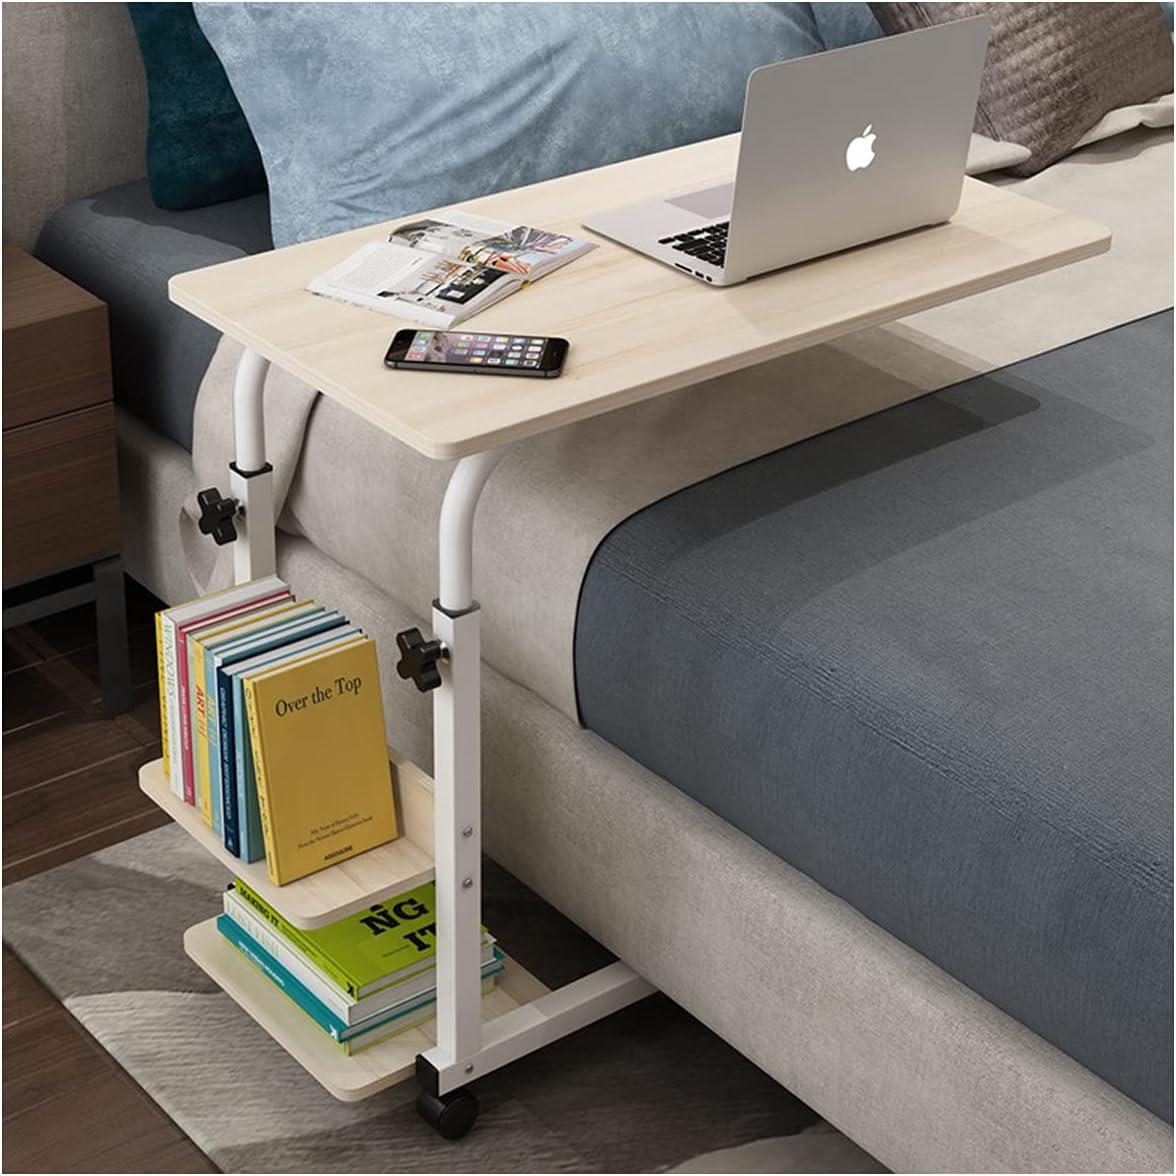 Medical Adjustable Overbed Bedside 男女兼用 Table Desk Movable Cabinet 安全 w